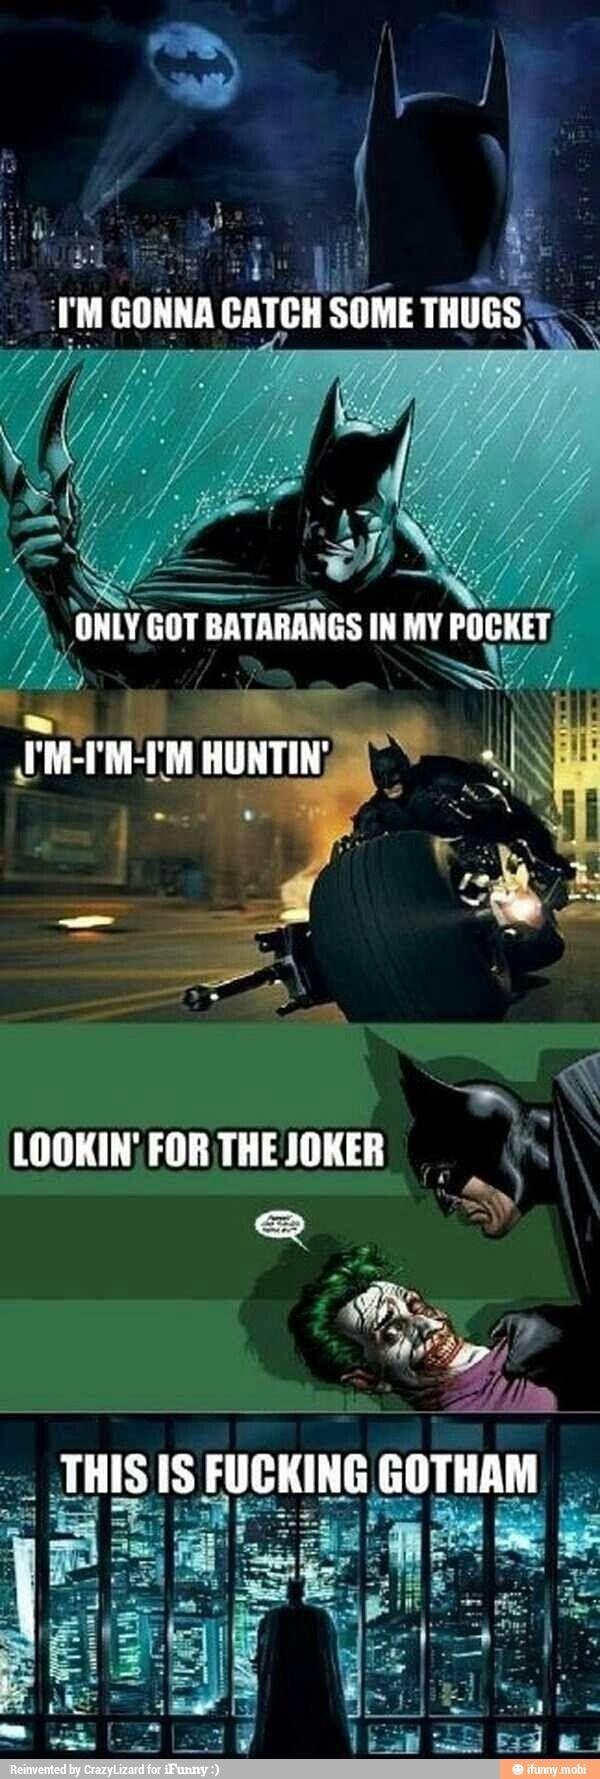 Haha. Love this!